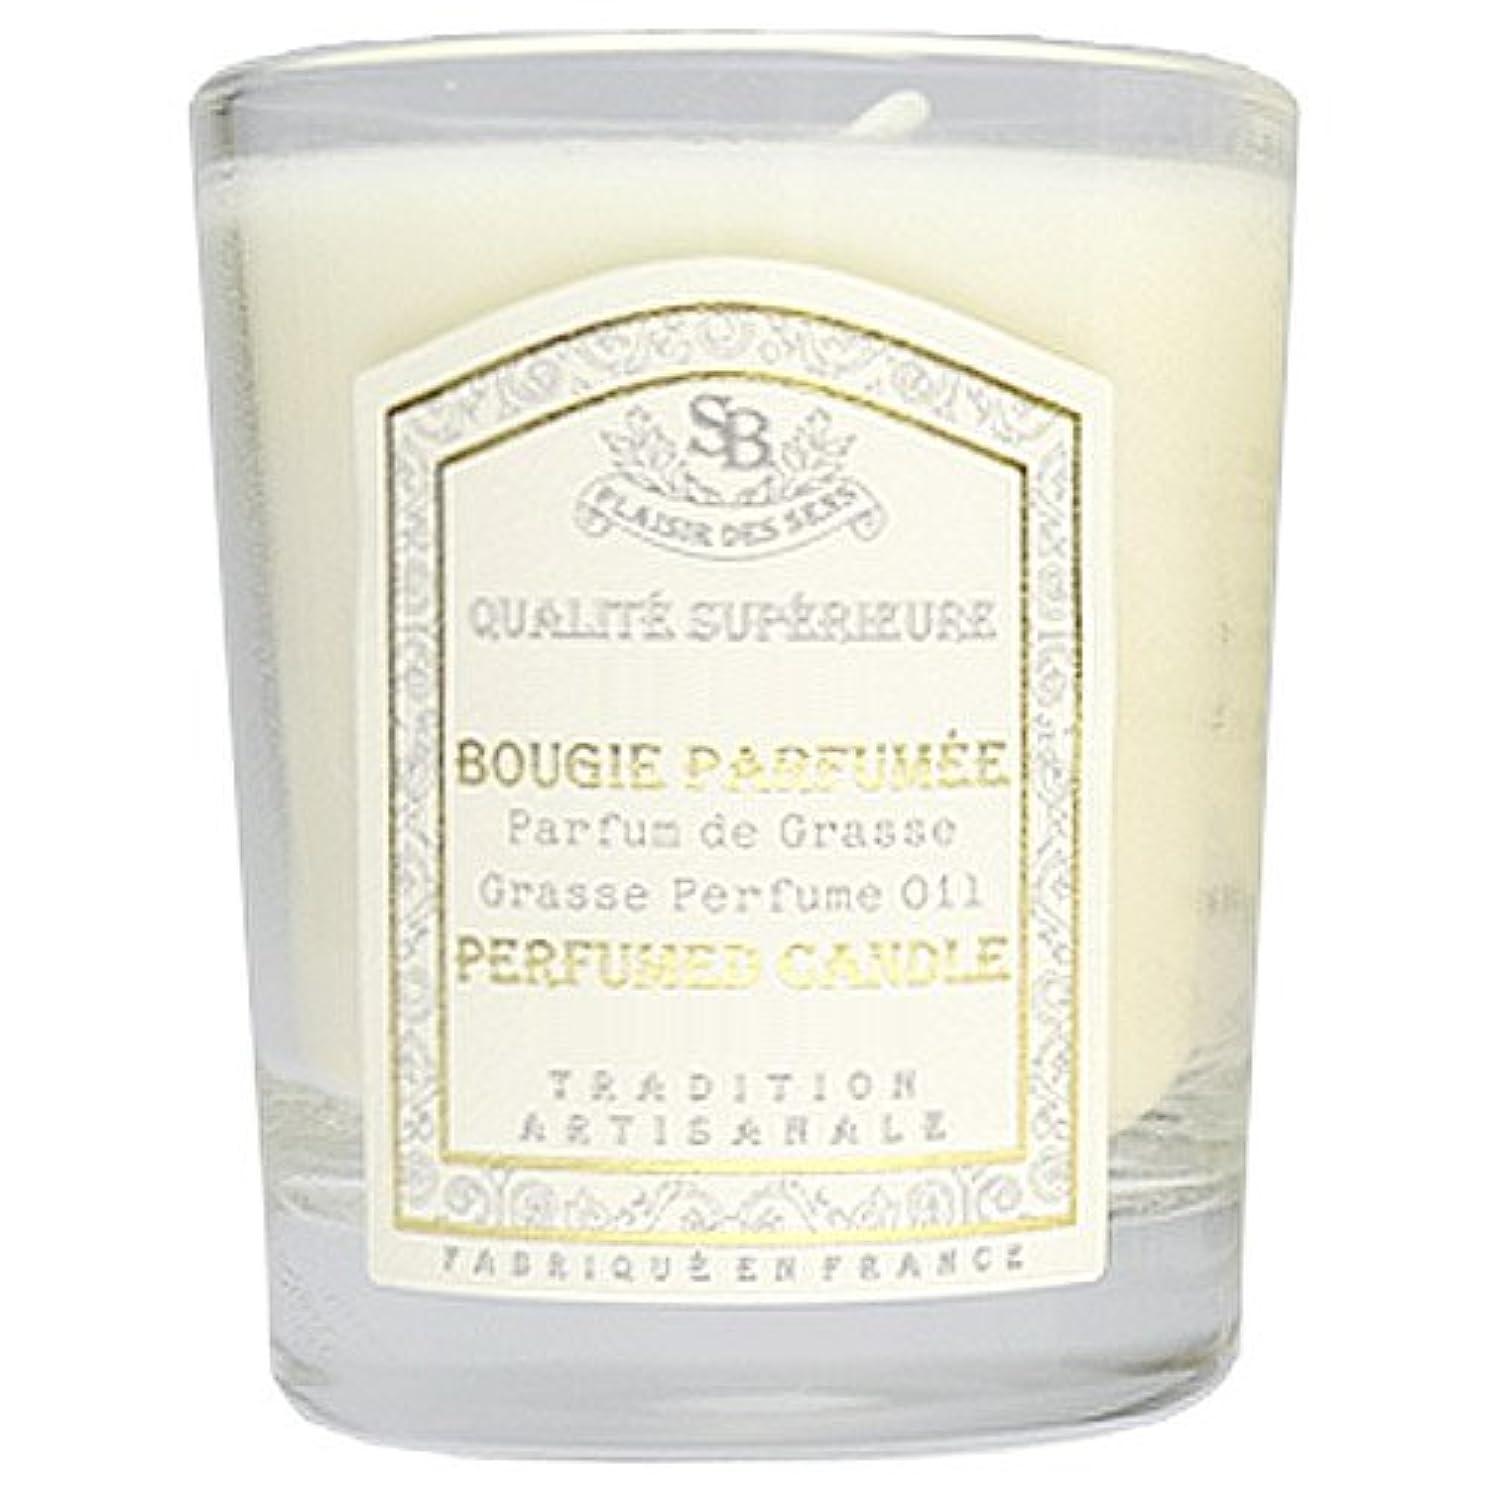 Senteur et Beaute(サンタールエボーテ) フレンチクラシックシリーズ グラスキャンドル 90g 「コットンリネン」 4994228021984